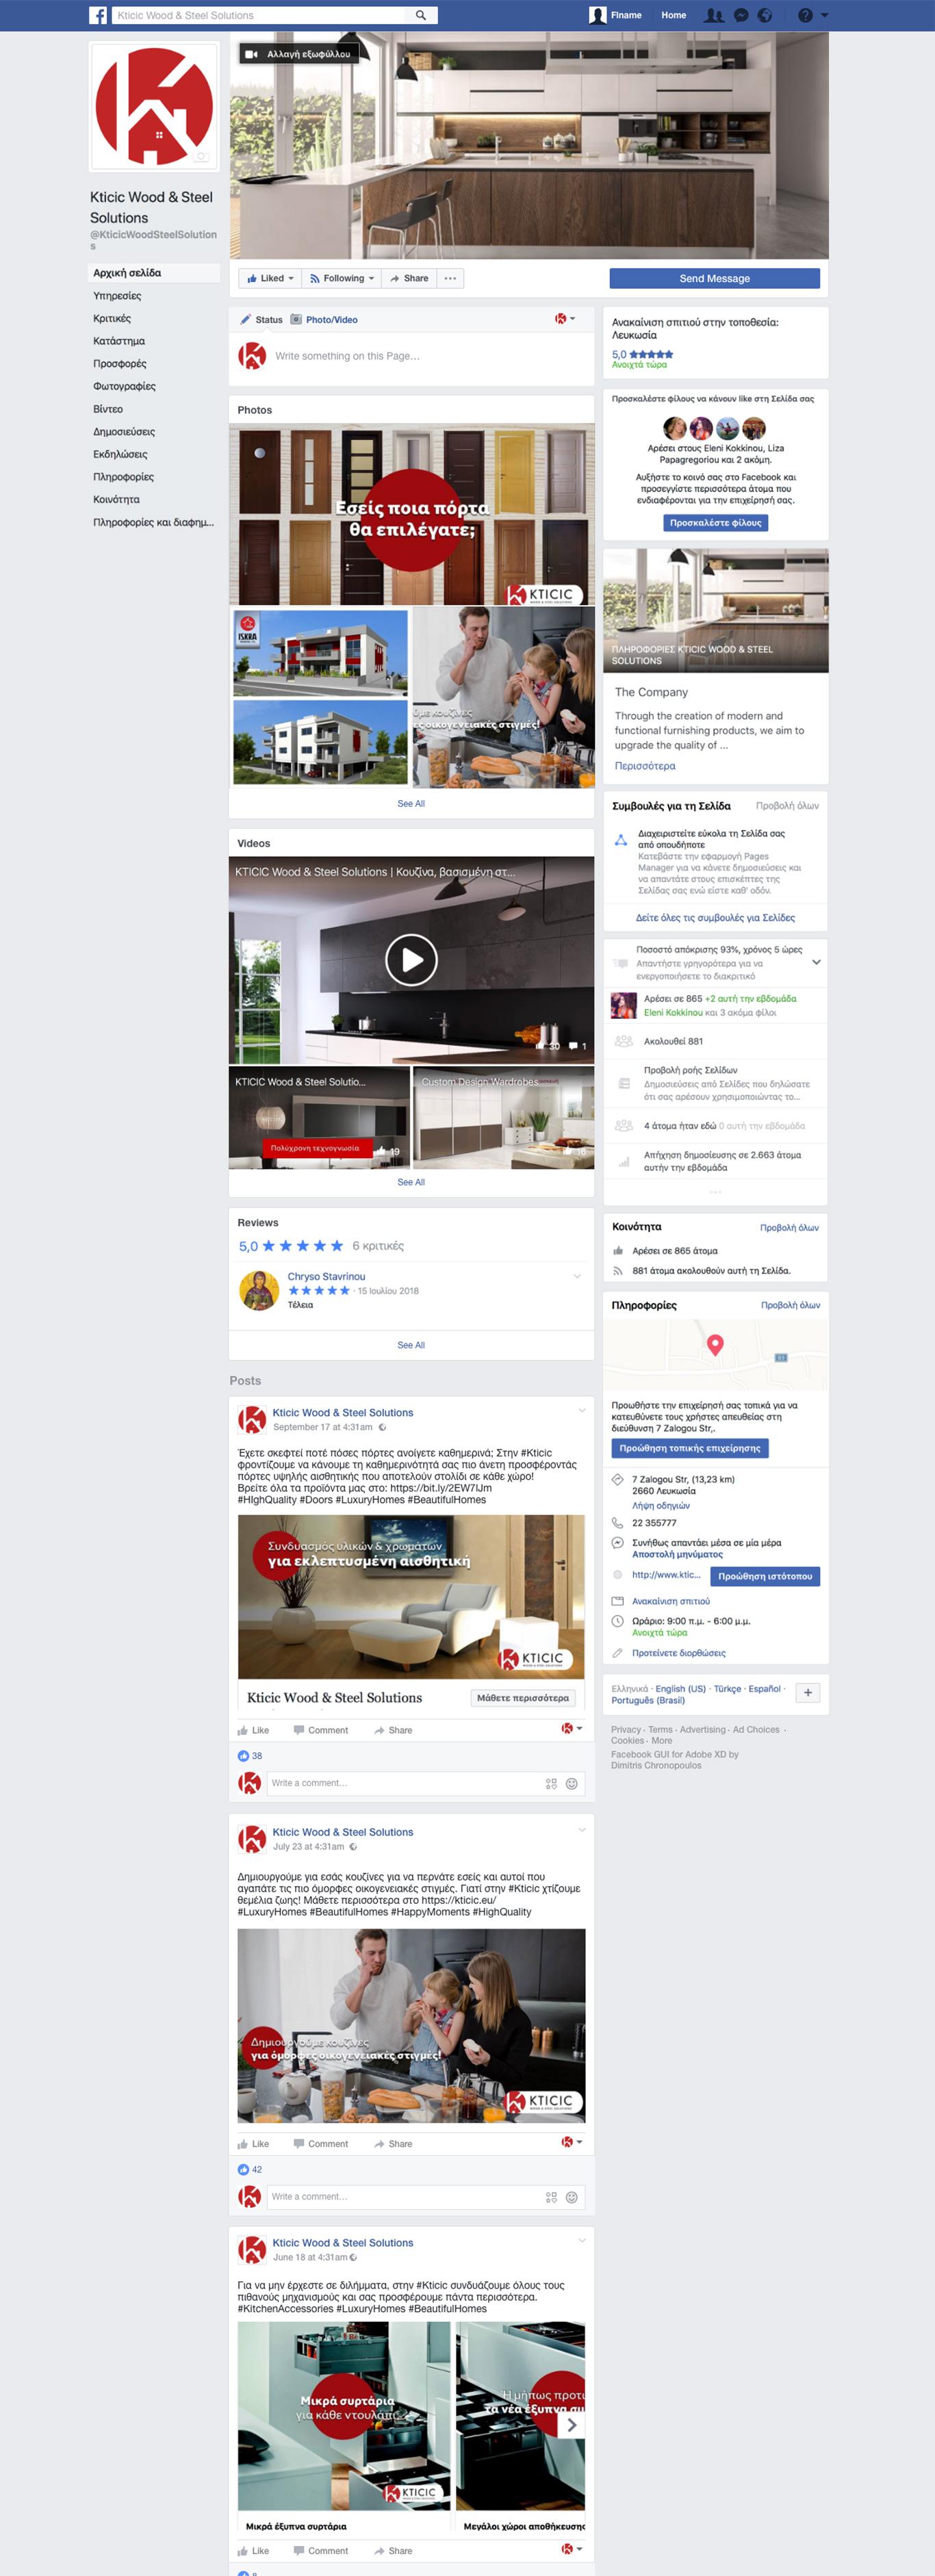 Darkpony-cyprus-project-facebook-KTICIC-social-media